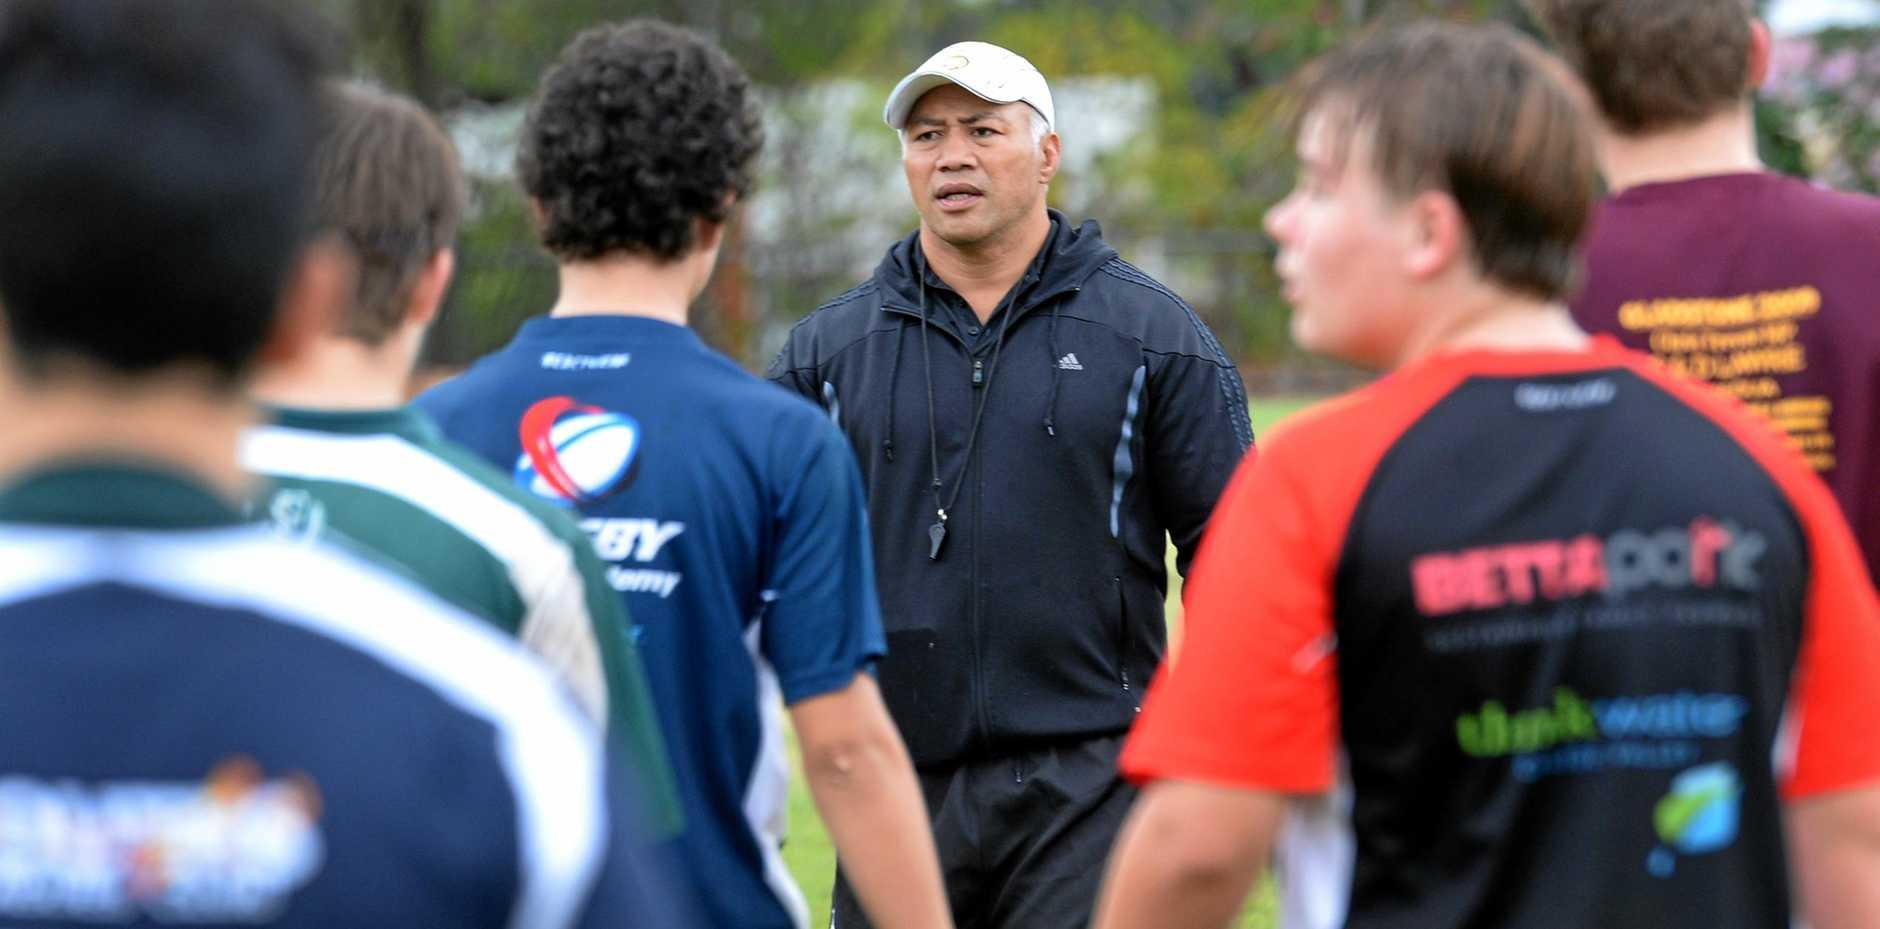 SKILLED UP: Coach Onehunga Mata'uiau puts the CQ Bushrangers under-14 players through their paces at a training camp at Rocky Grammar.